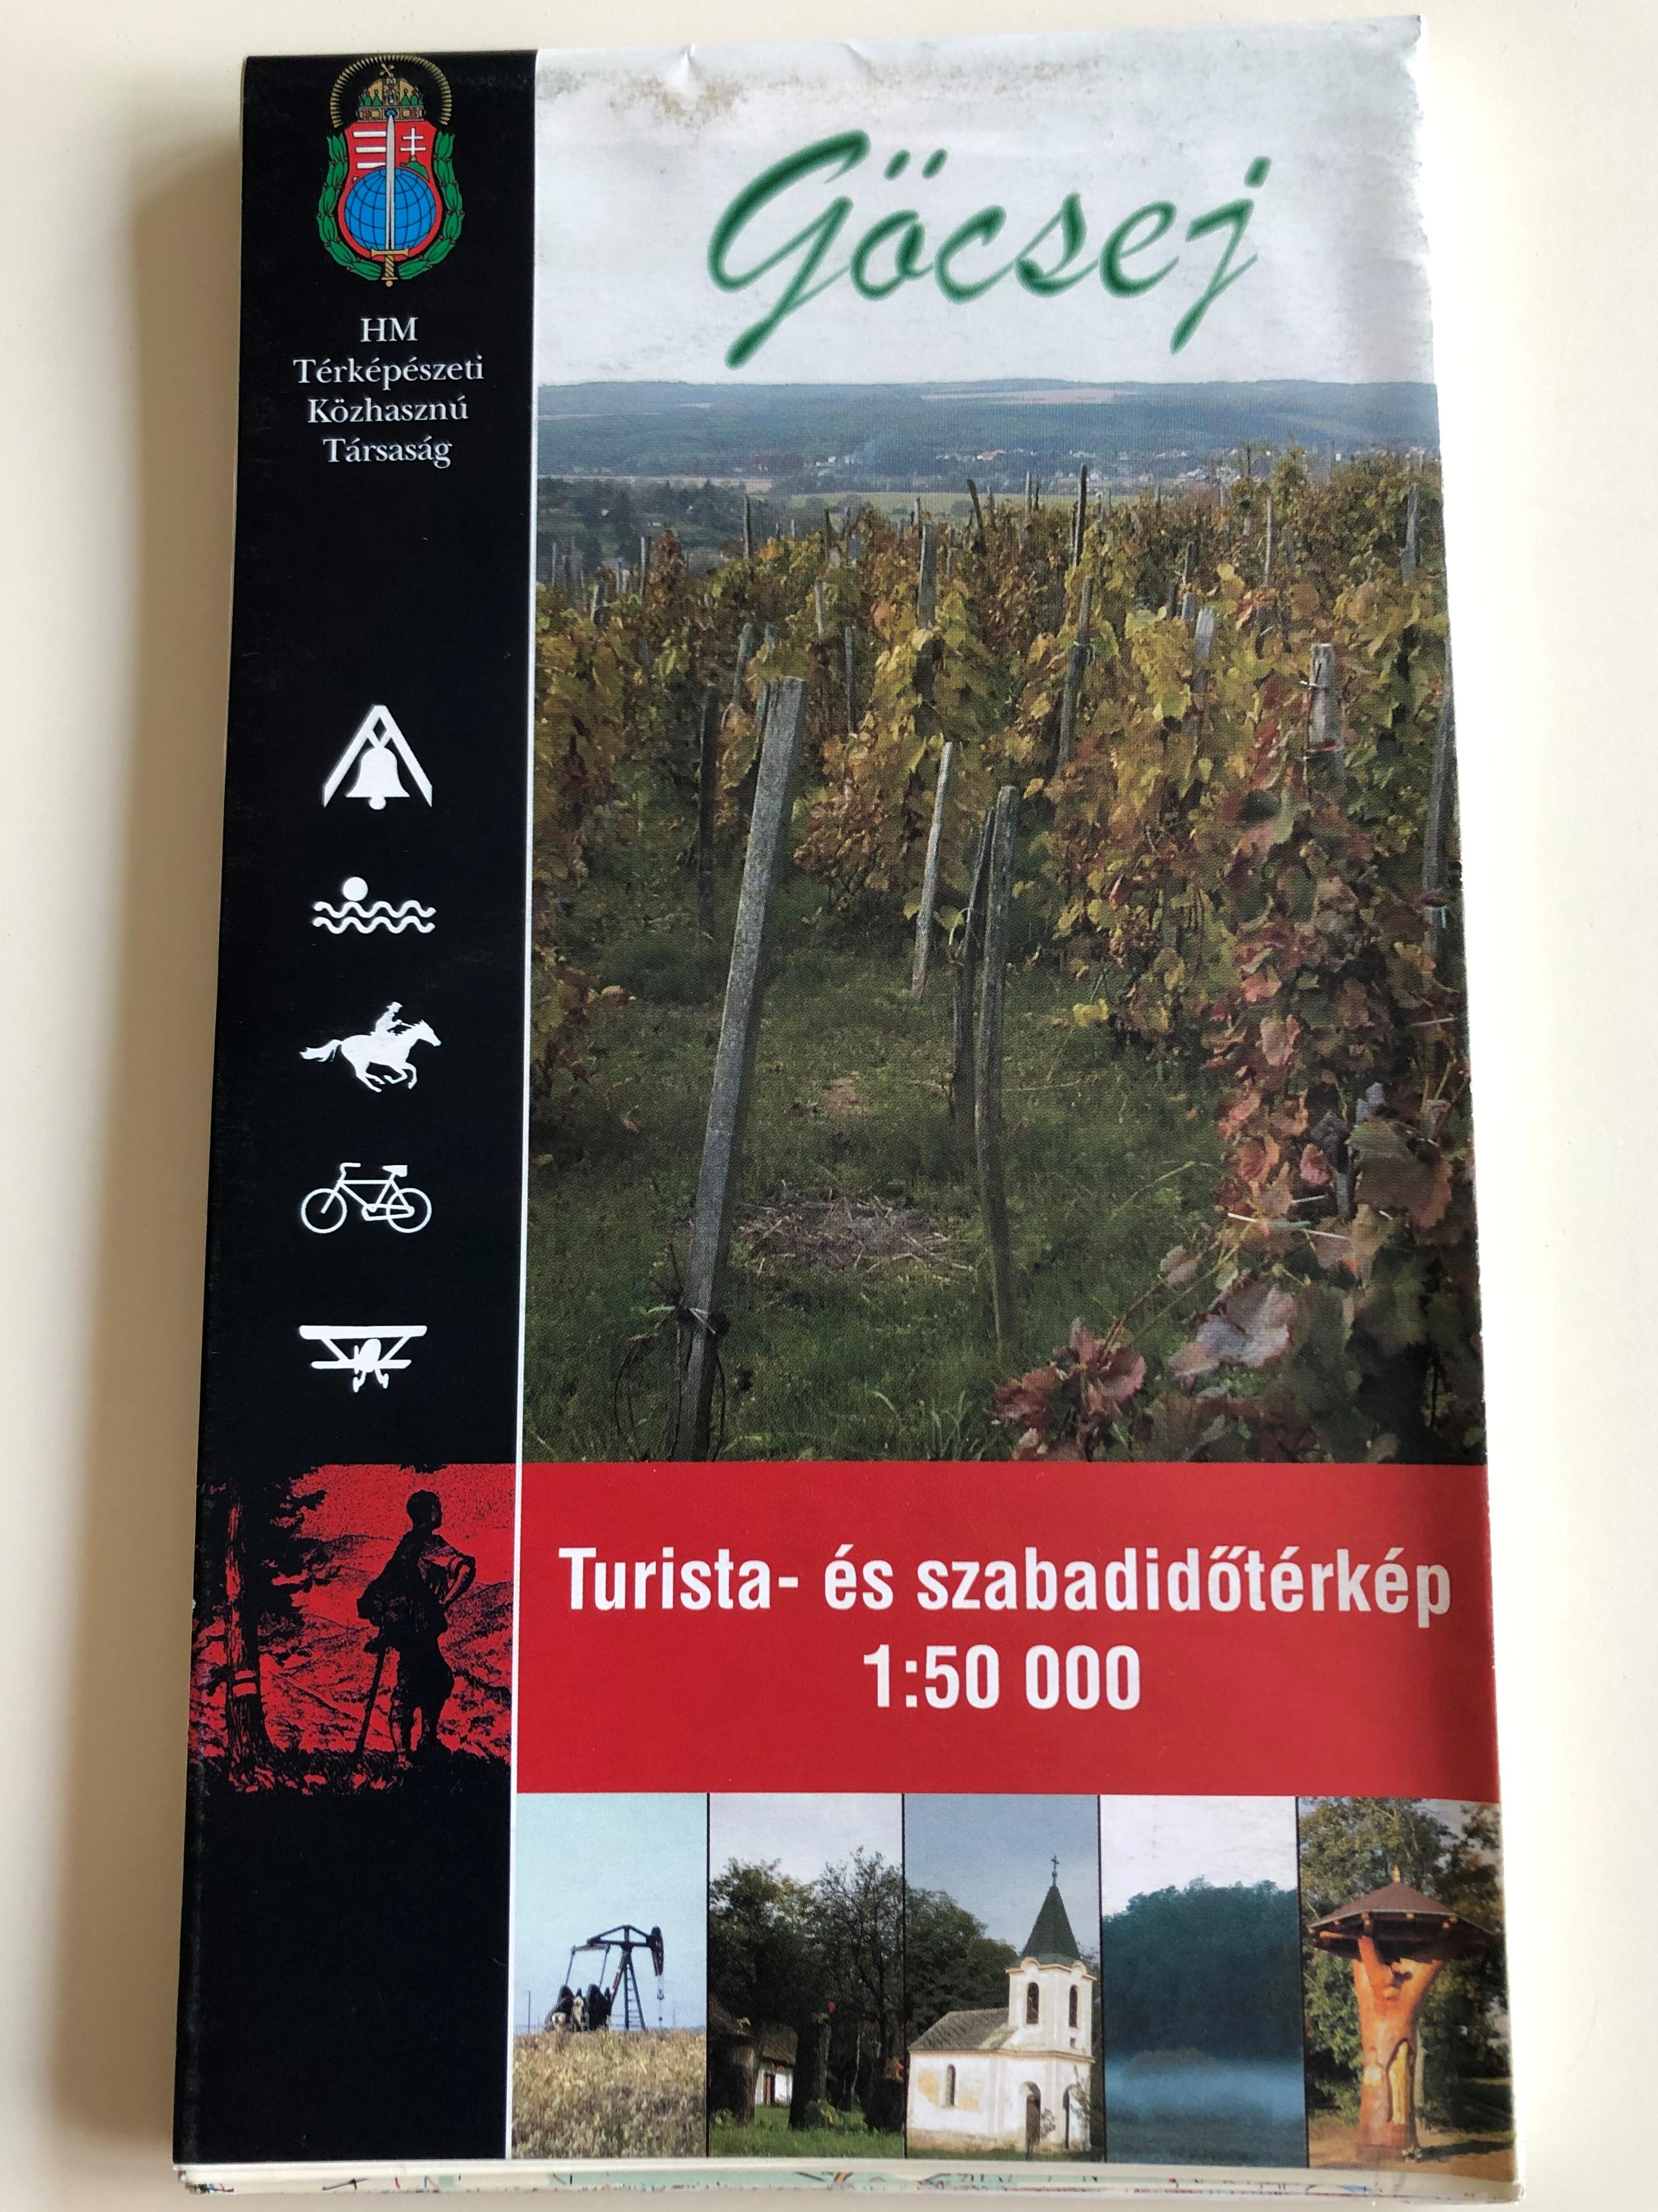 g-csej-szabadid-s-turistat-rk-p-1-50.000-tourist-and-free-time-map-of-the-g-csej-region-hungarian-english-and-german-legend-1-.jpg